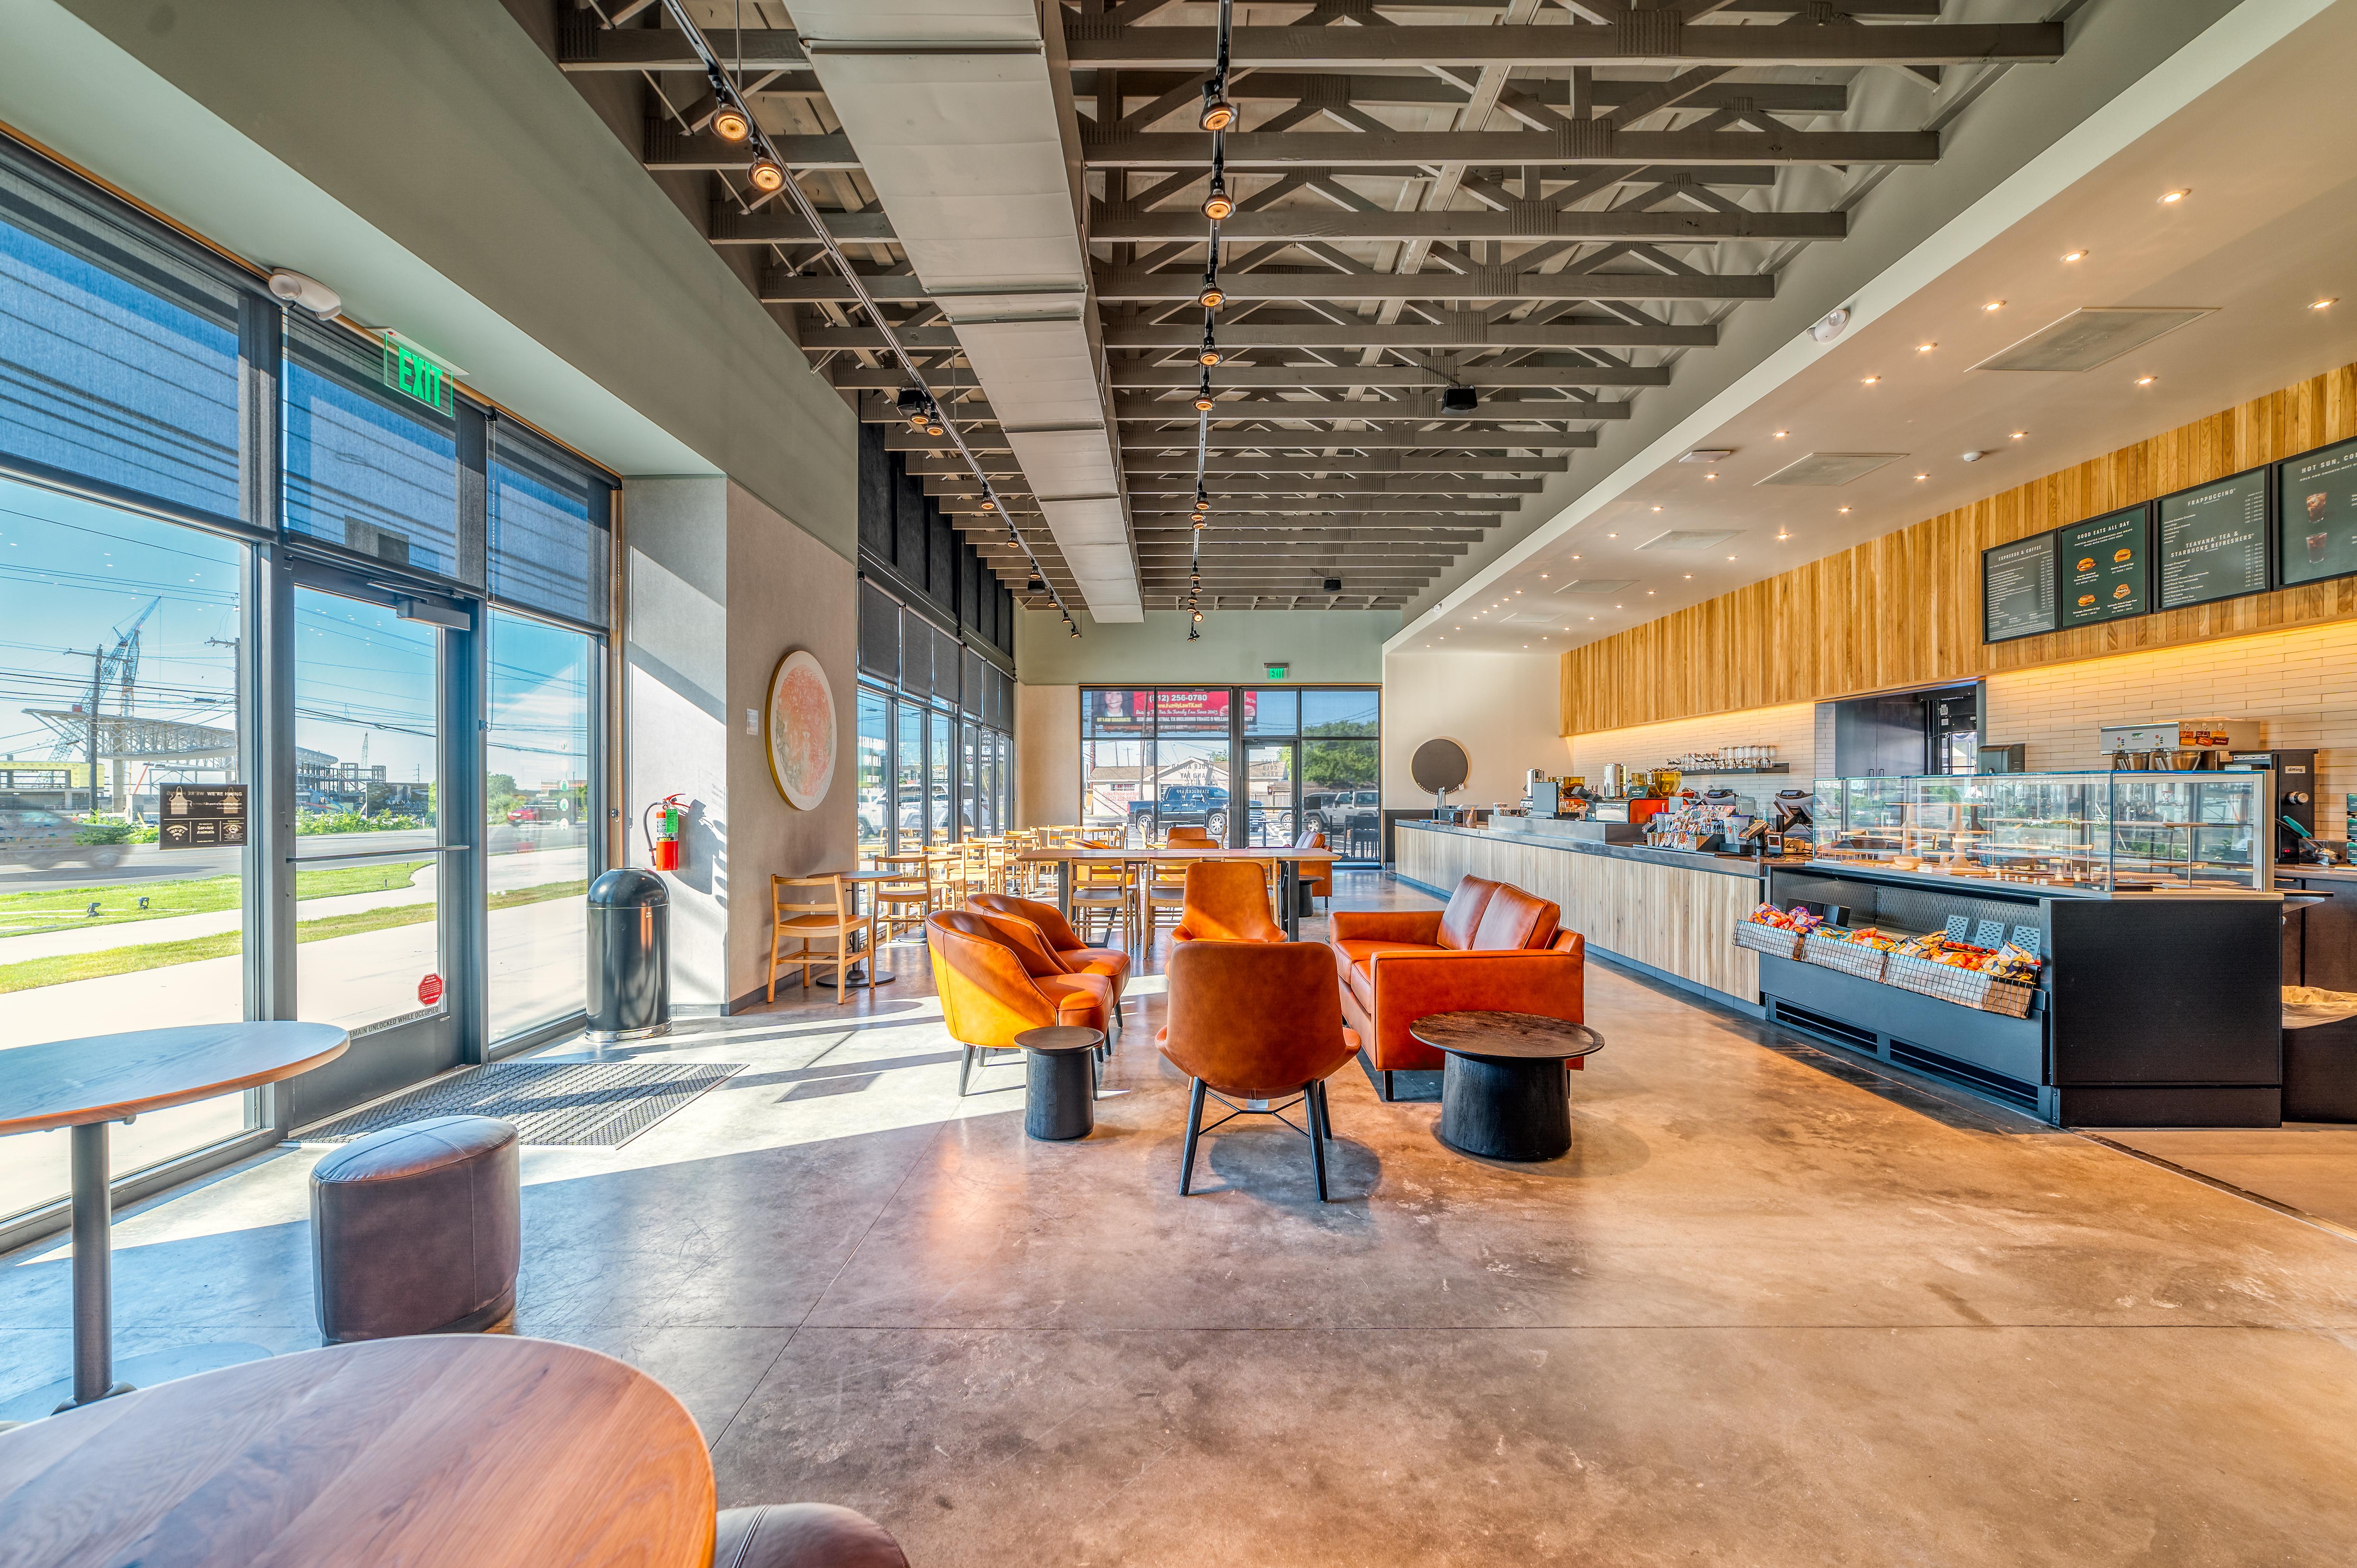 Starbuck's Interior